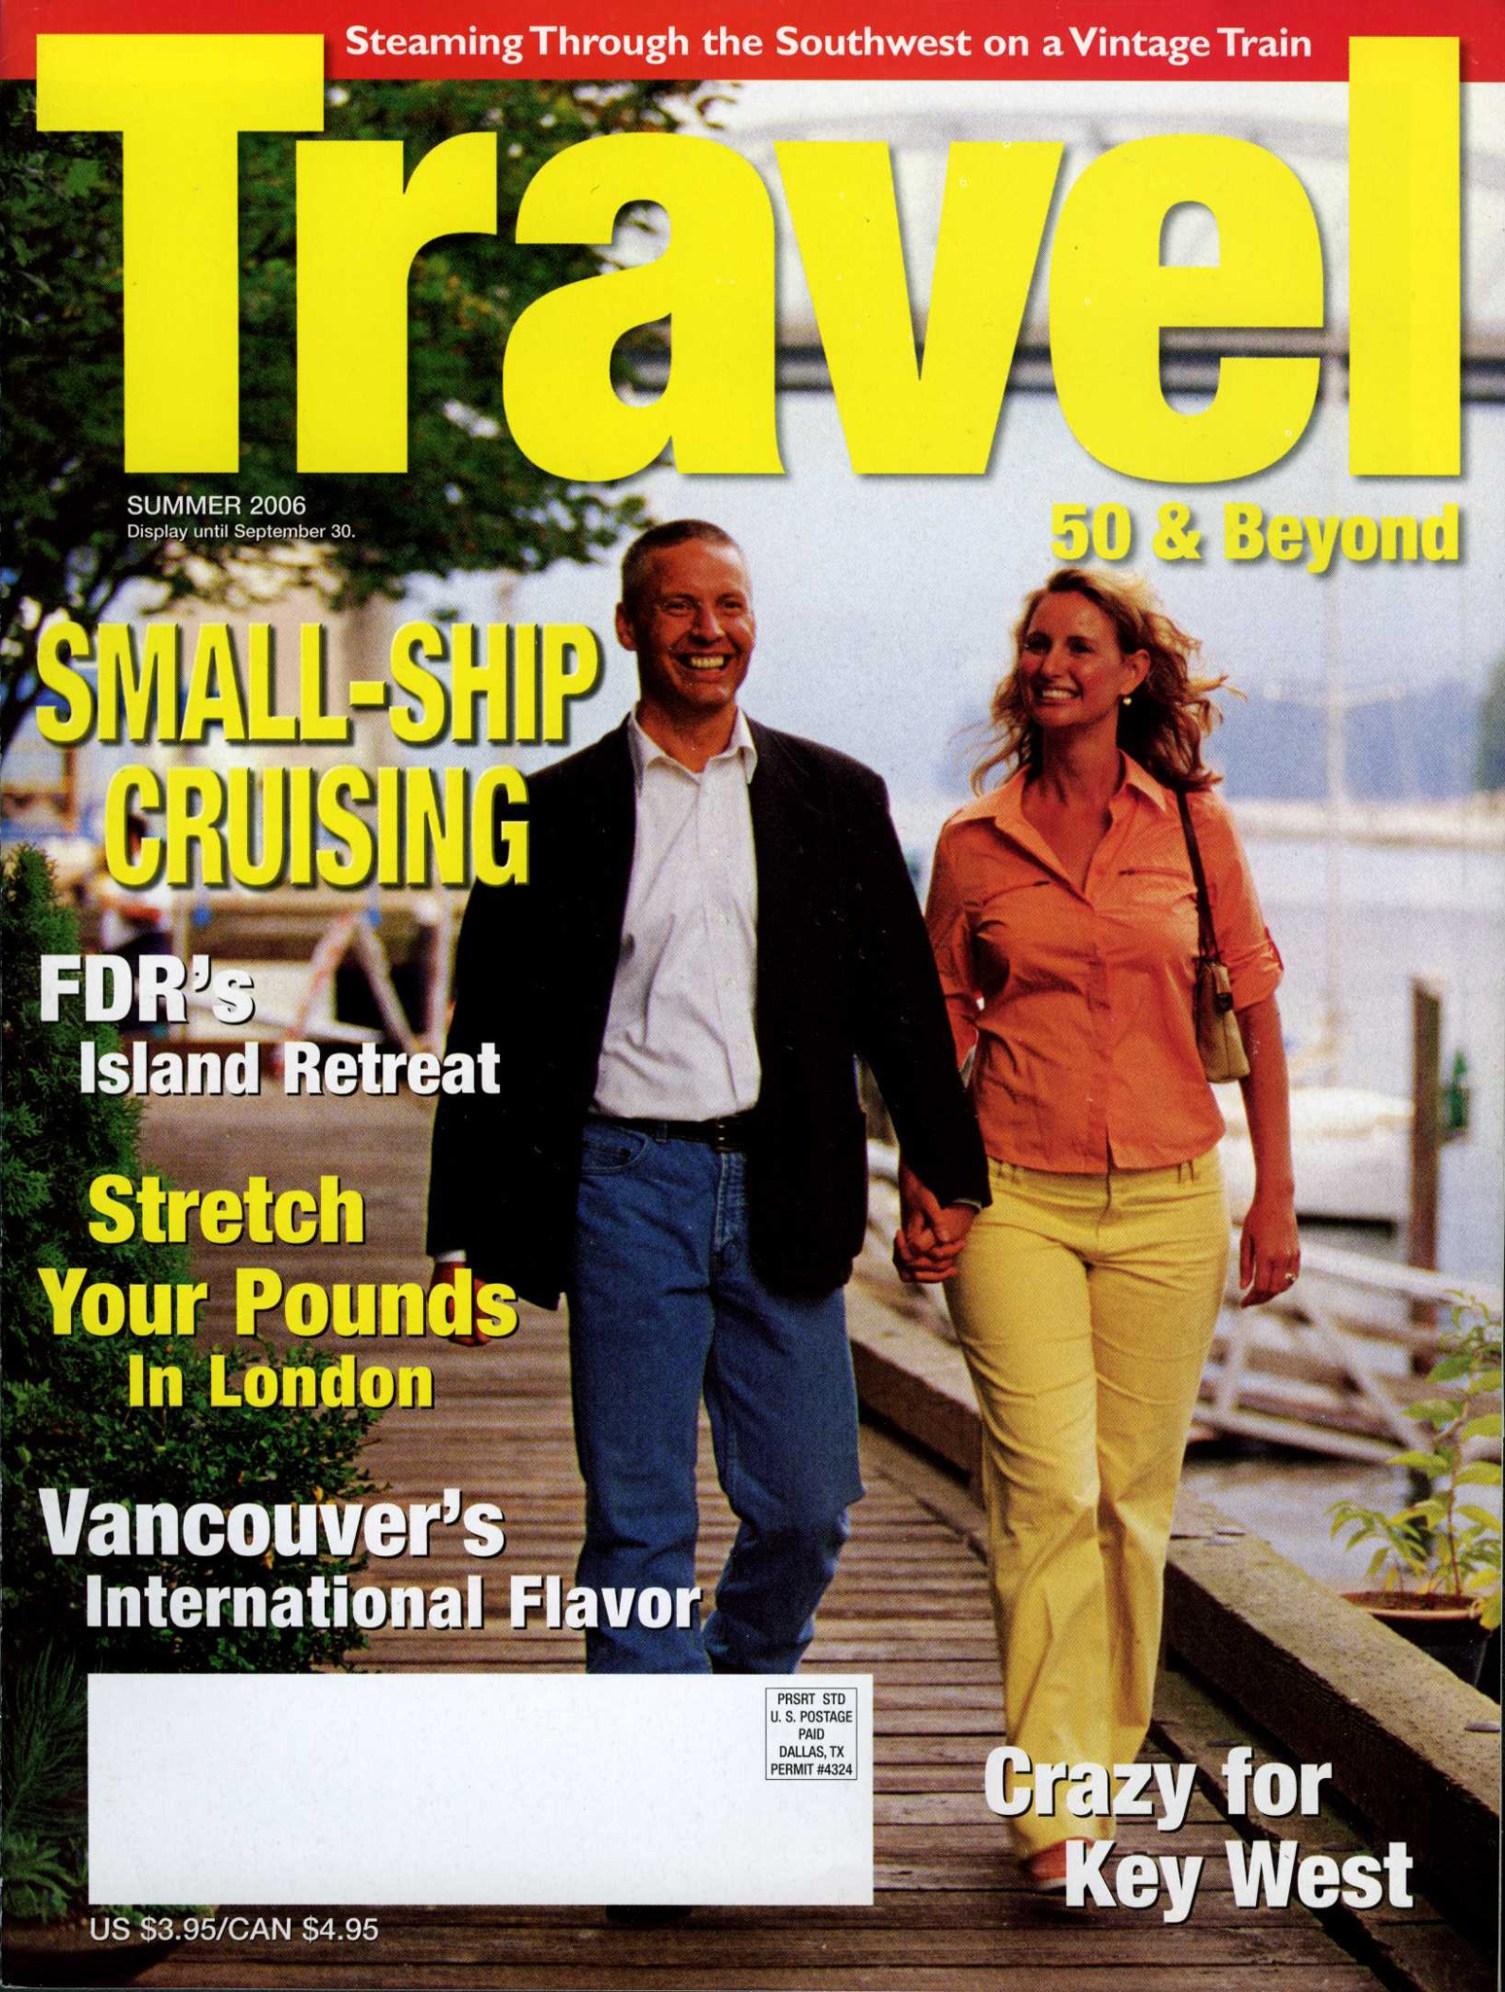 TFB_COVER_Summer 2006_Small-Ship Cruising